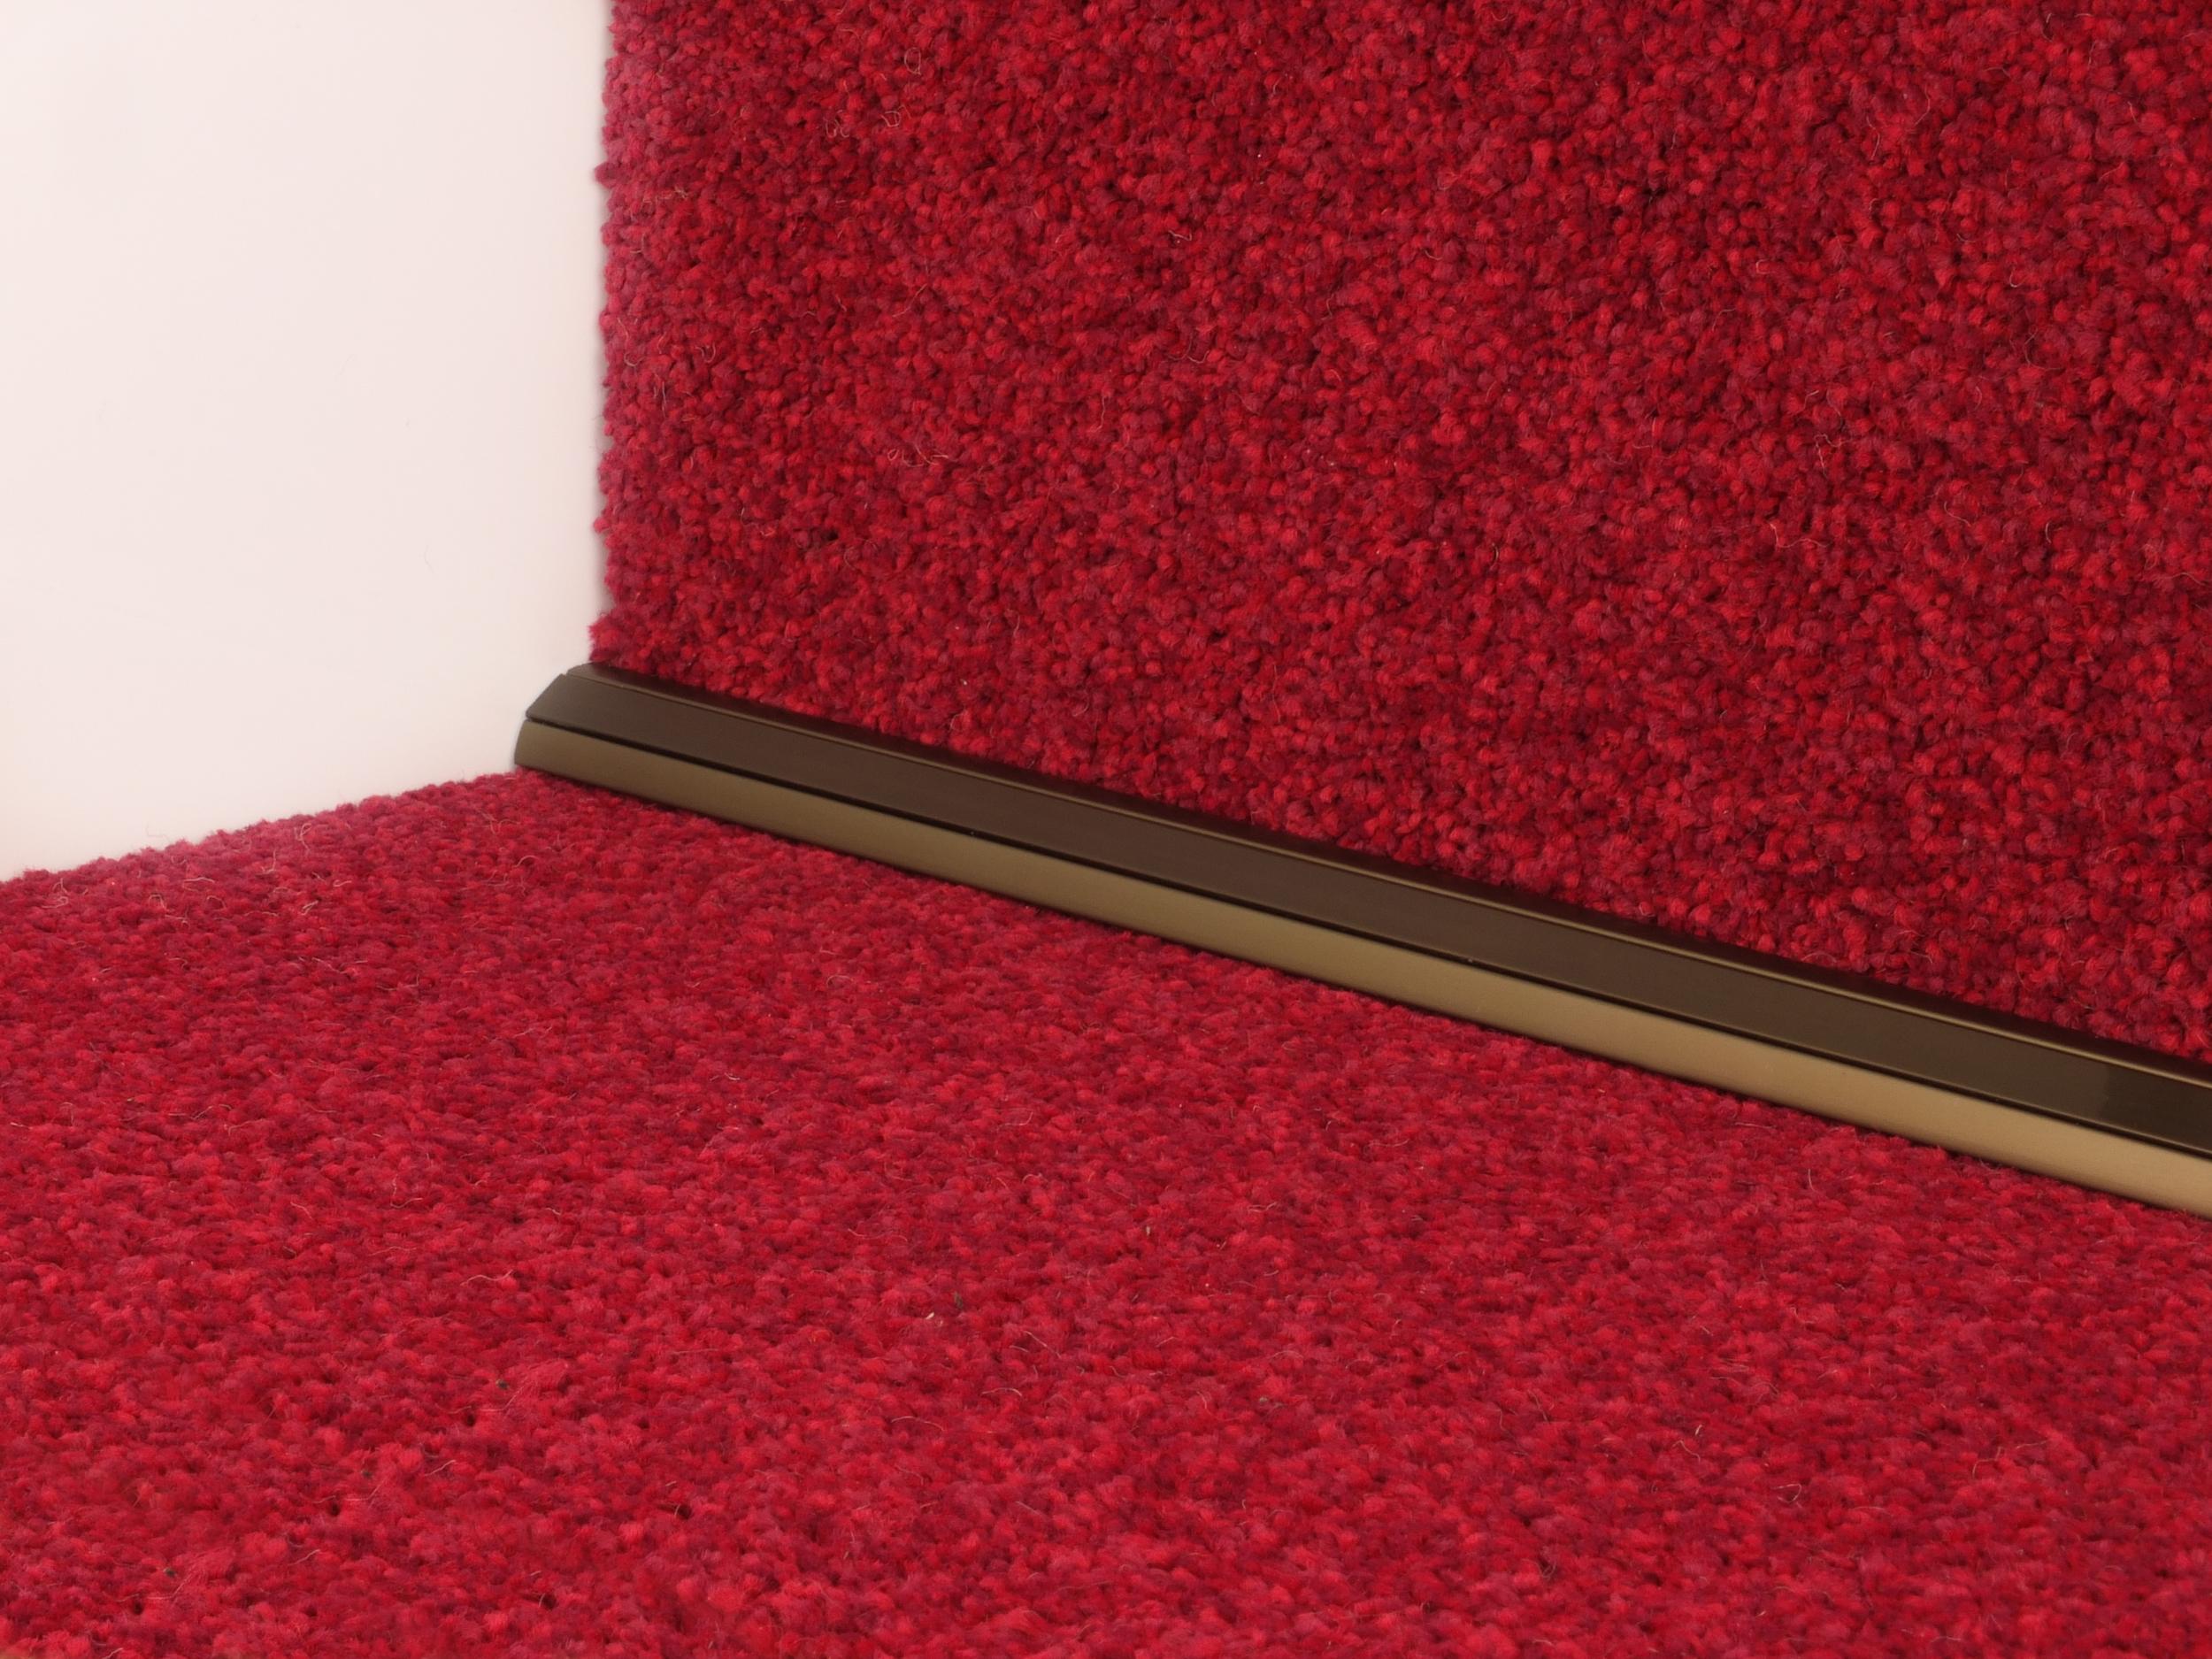 stairrods-stargrip-bronze-red-carpet.jpg